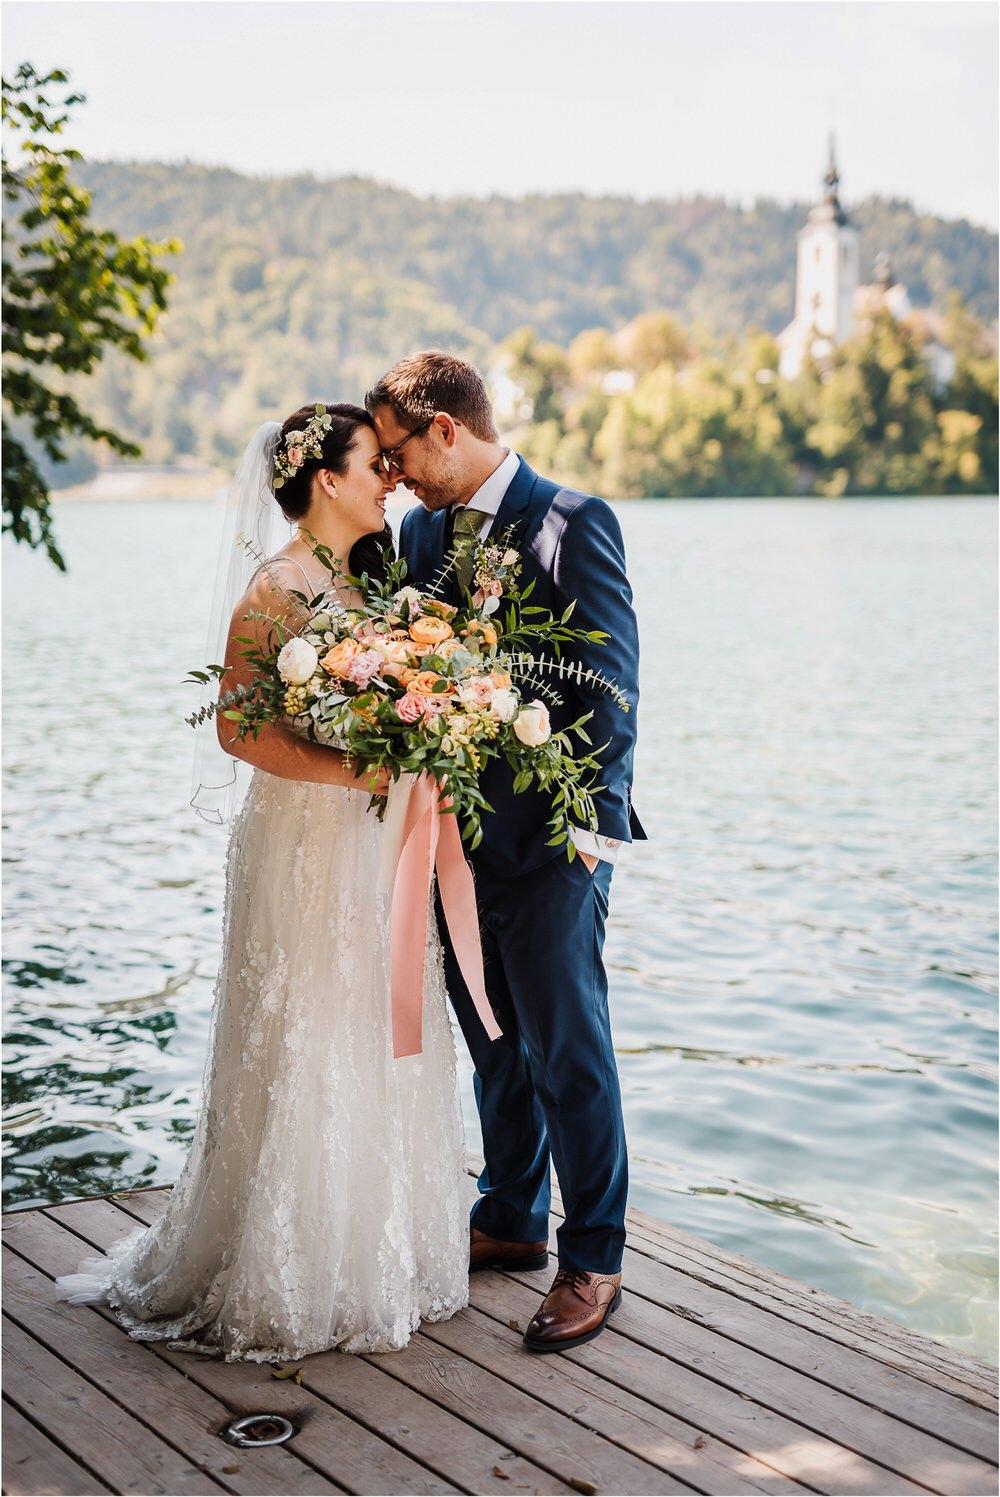 lake bled slovenia wedding vila bled sanjski sopek bled castle ceremony outdoor romantic wedding photographer photography natural candid bright 0075.jpg